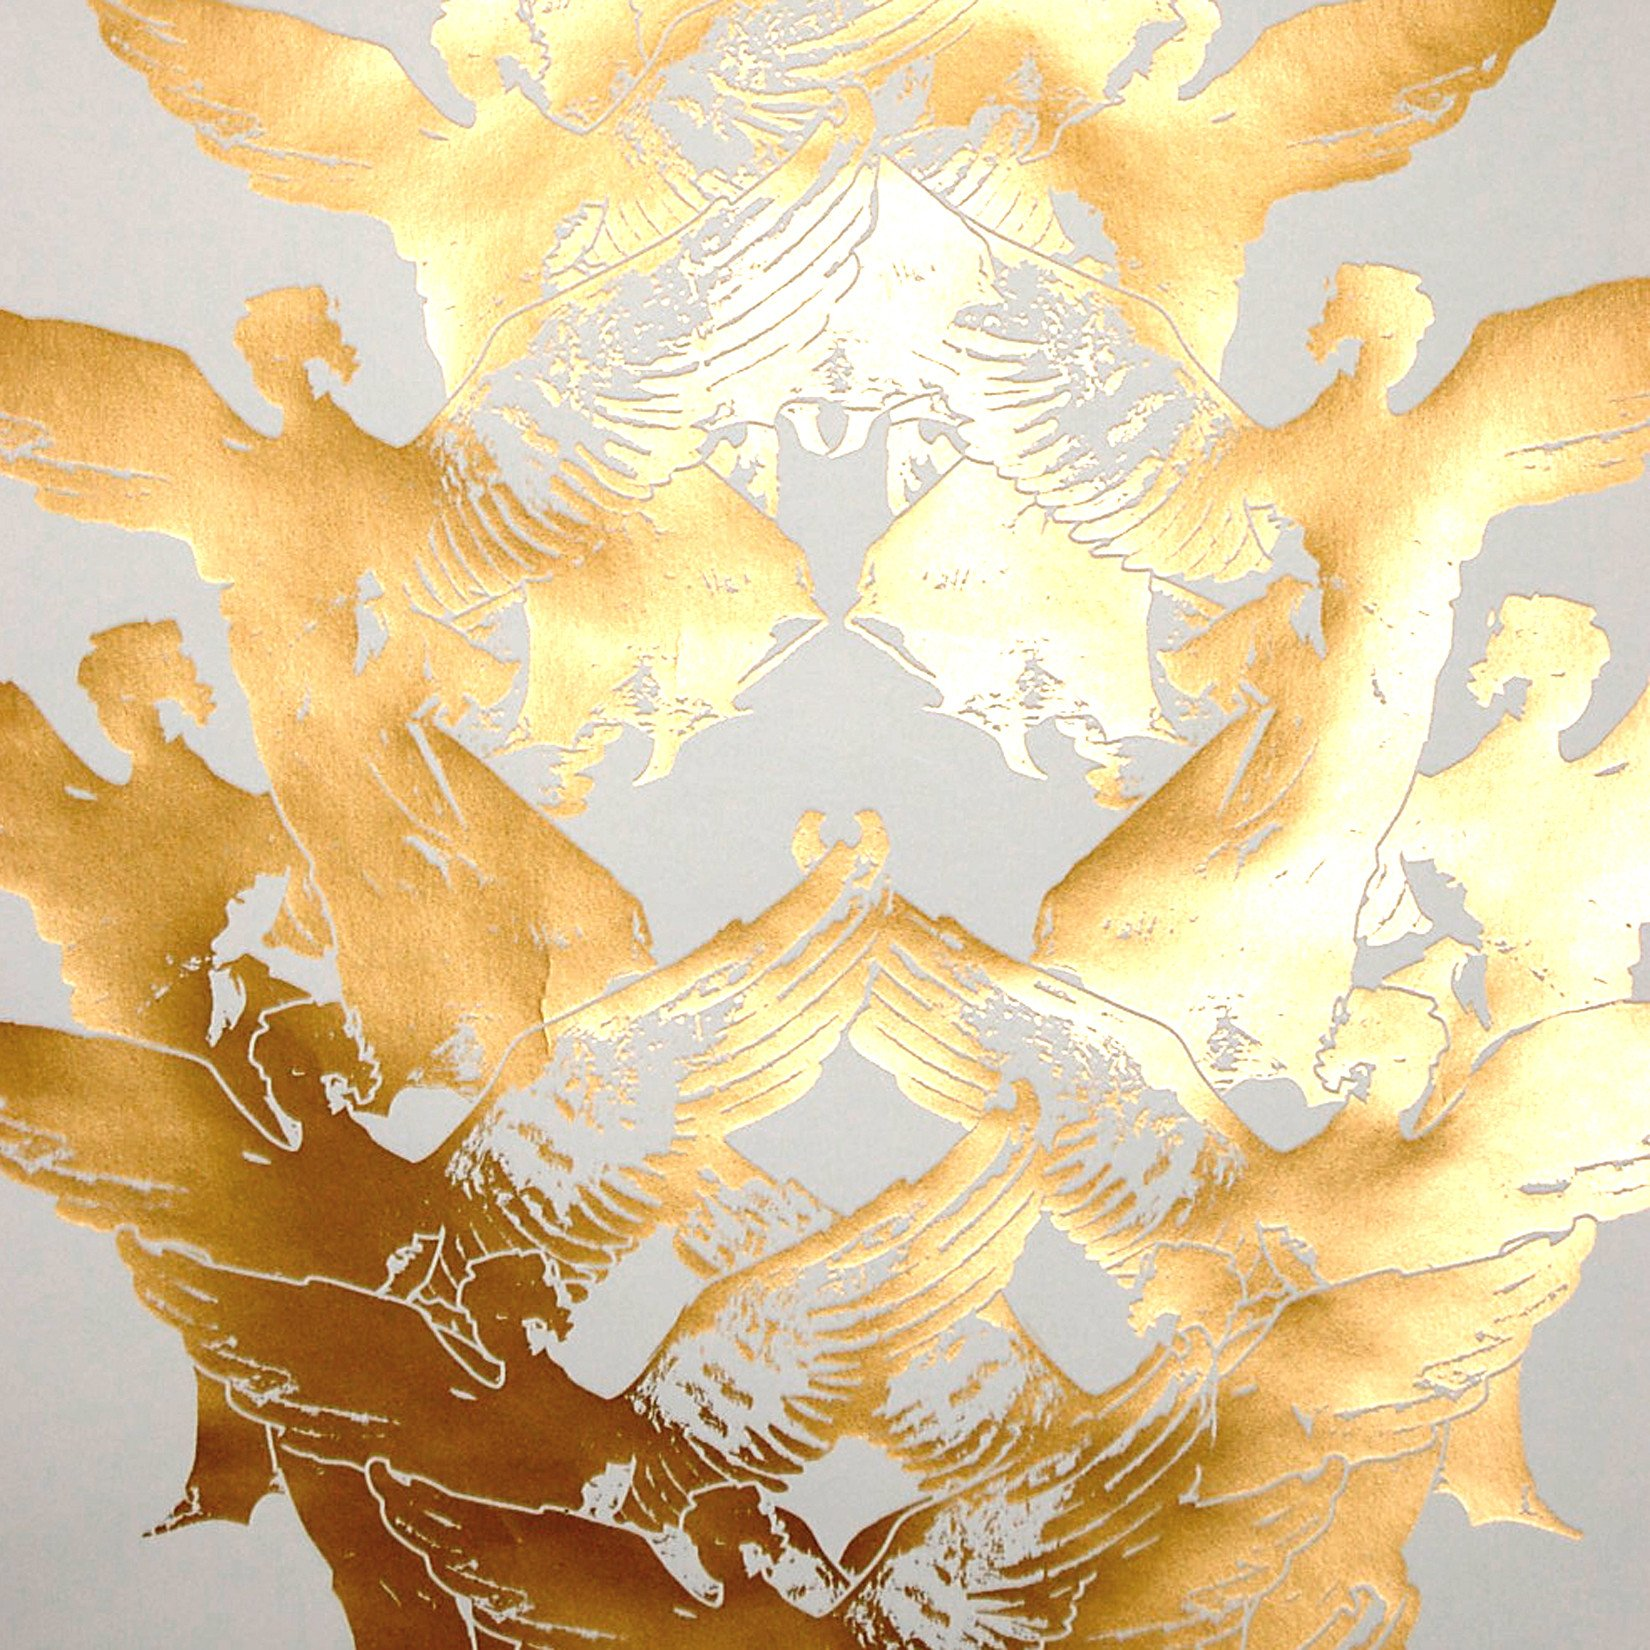 Aphrodite Wallpaper in Goldendust design by Jill Malek 1650x1650